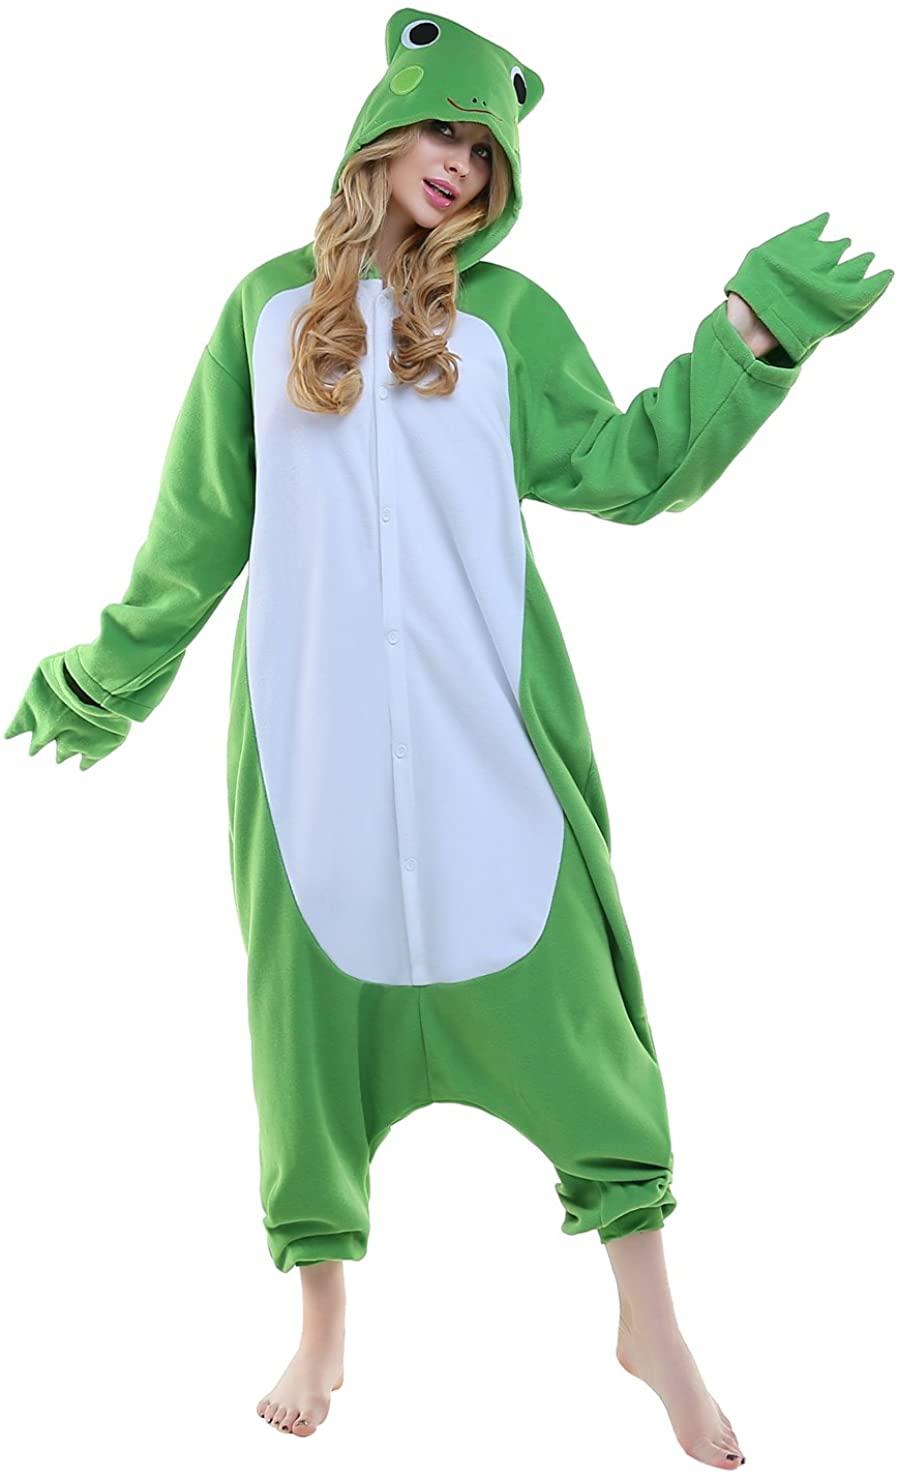 NEWCOSPLAY Adult Unisex Frog Onesie Pajama Costume